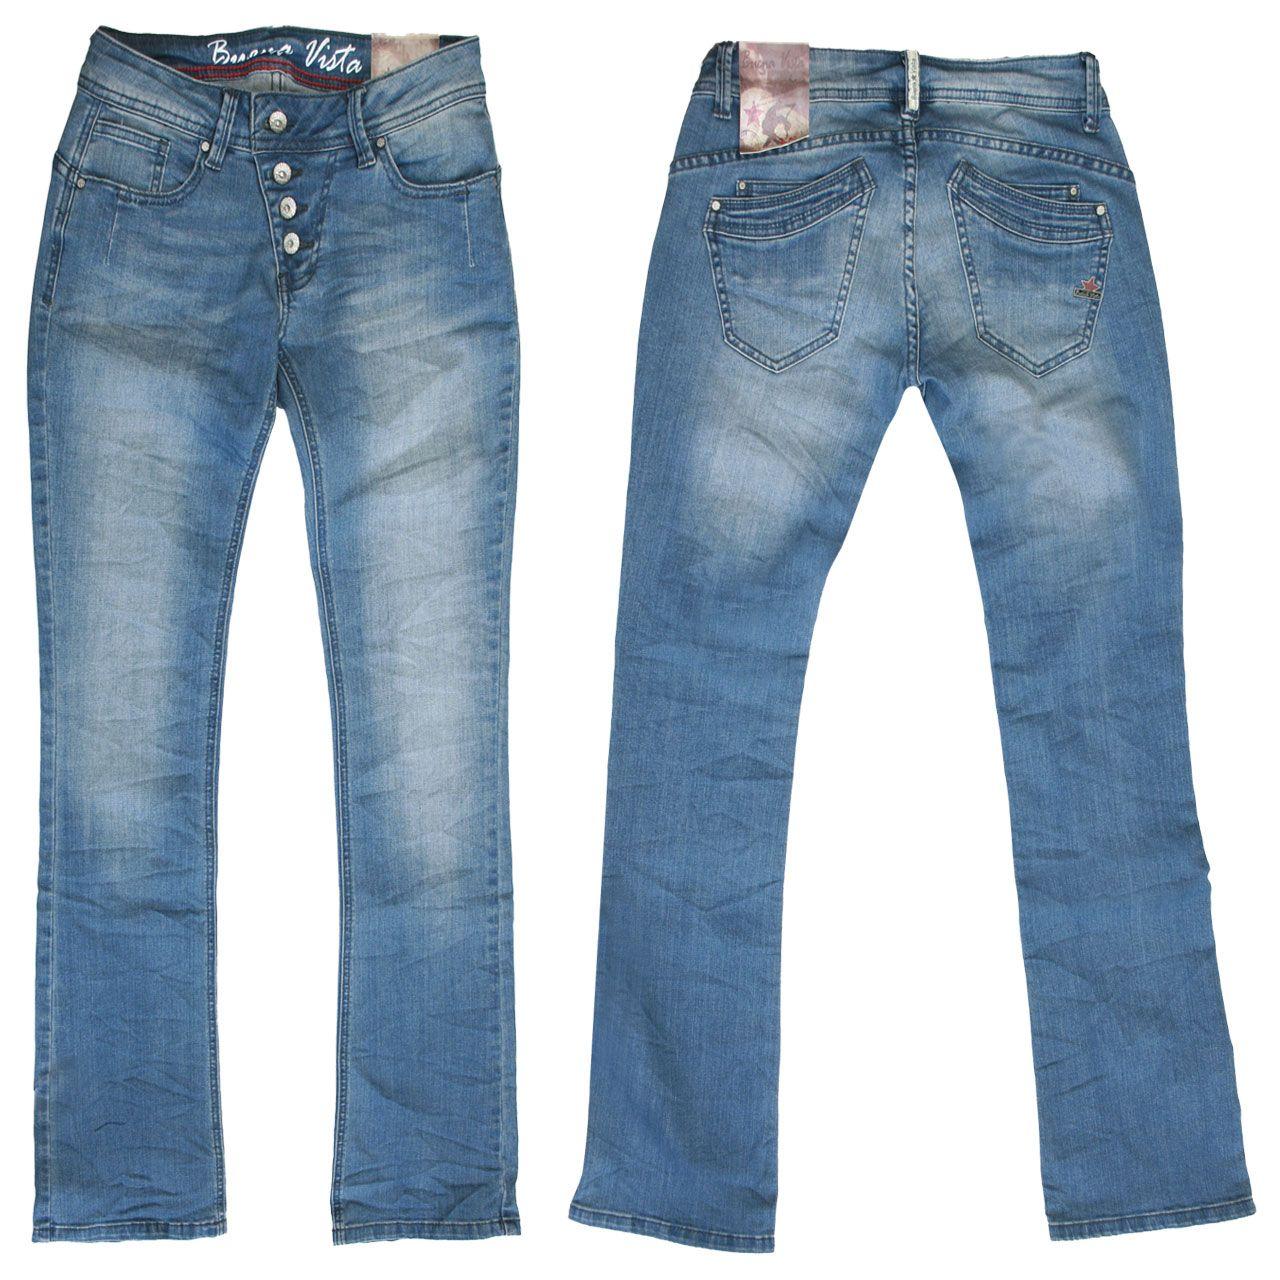 Buena Vista Jeans Malibu-Flare middle blue - Durch die schöne ...